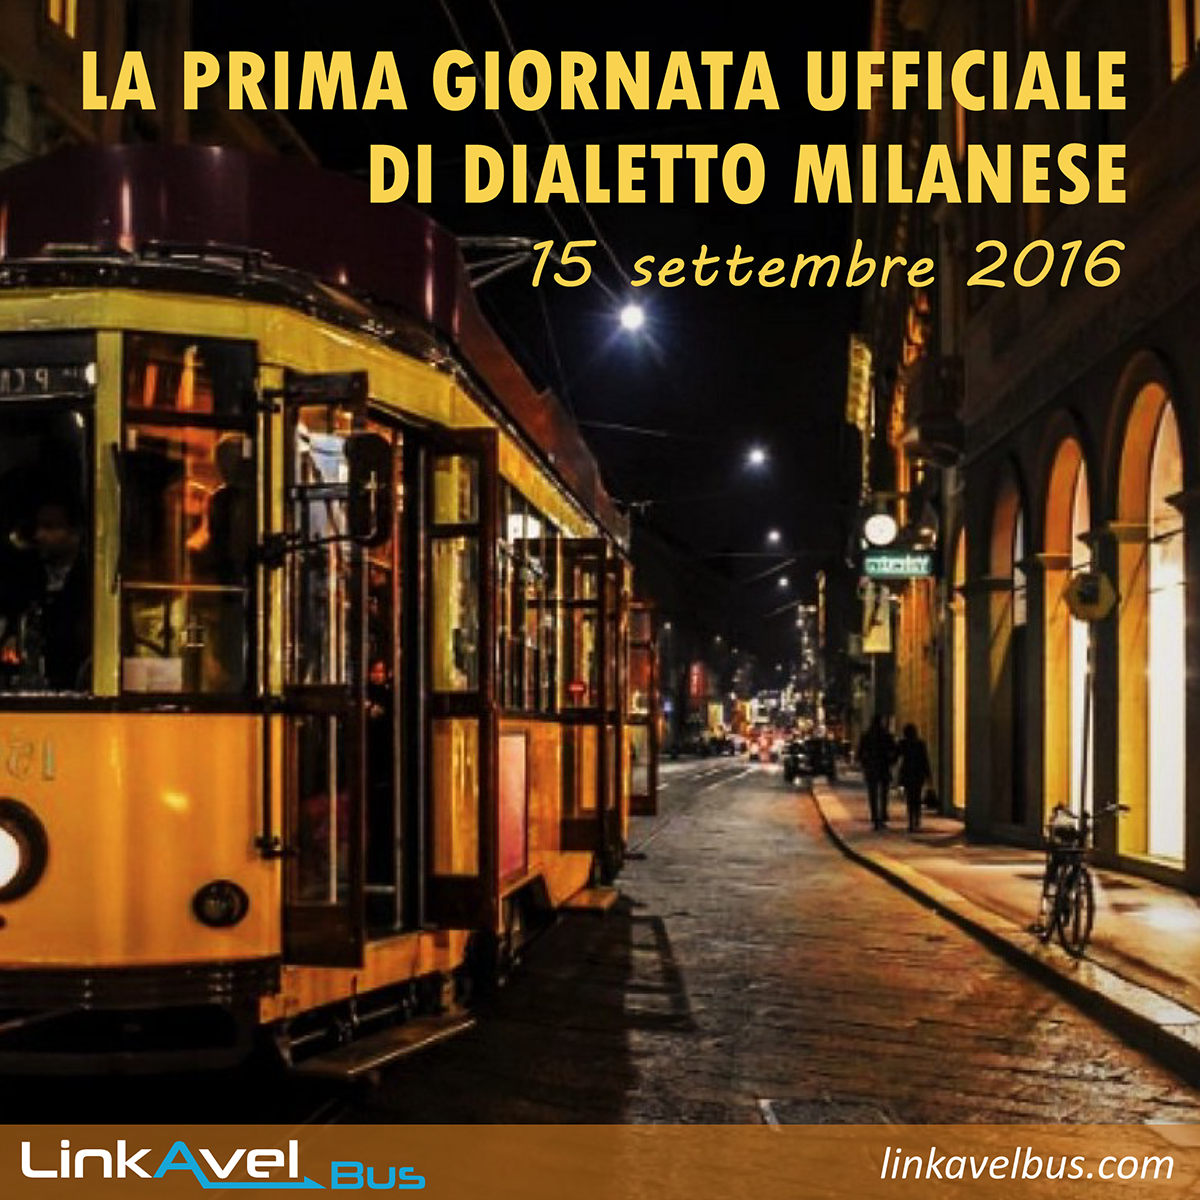 Post dialetto milanese Linkavel. Milano in bus. Viaggia con Linkavel